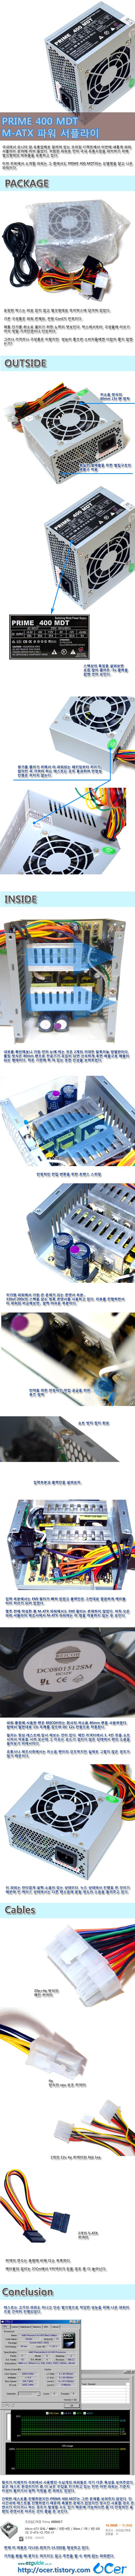 [POWER/파워]. DC파워서플라이, 전원공급기, 파워서플라이가격, PC파워서플라이, 파워서플라이추천, 멀티미터중고파워서플라이, 컴퓨터파워서플라이, 파워서플라이테스트, 전원공급장치, AC파워서플라이멀티테스터, 파워서플라이수리, 파워서플라이종류, 파워서플라이600W, 파워서플라이소음, 파워서플라이교체, 파워서플라이사용법, 인버터, power, 컴퓨터부품, pc부품, PC, pc리뷰, IT뉴스, IT리뷰, It, 타운리뷰, 리뷰, 이슈, ocer리뷰, pc하드웨어, 하드웨어 리뷰, 사진, OCER, 타운뉴스, 타운포토,